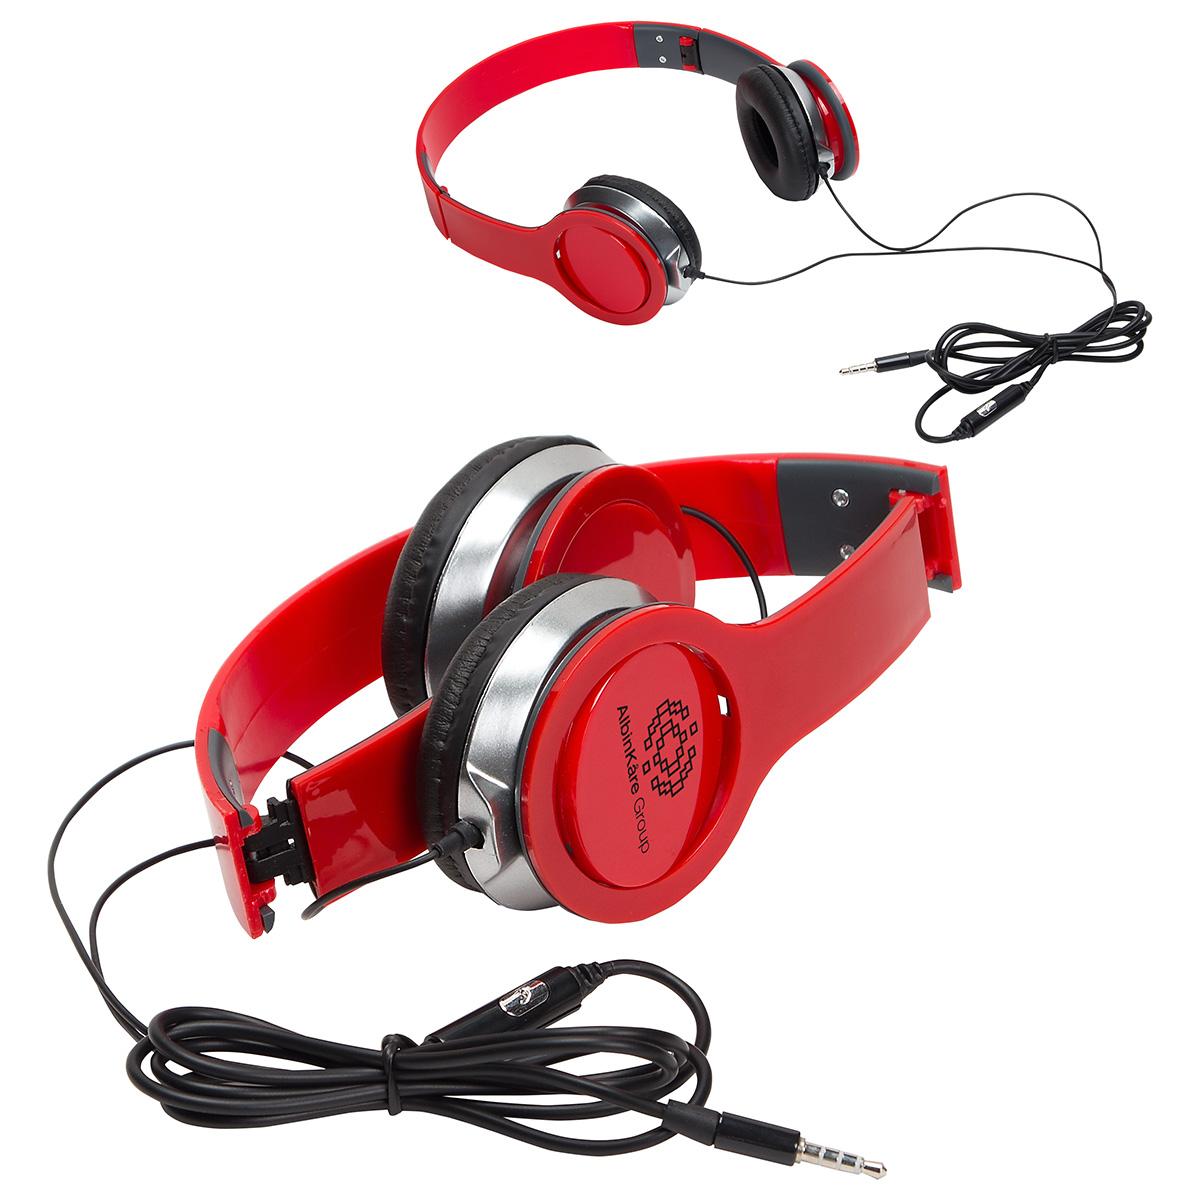 Moji Foldable Headphones with Mic, WTV-MF16 - 1 Colour Imprint